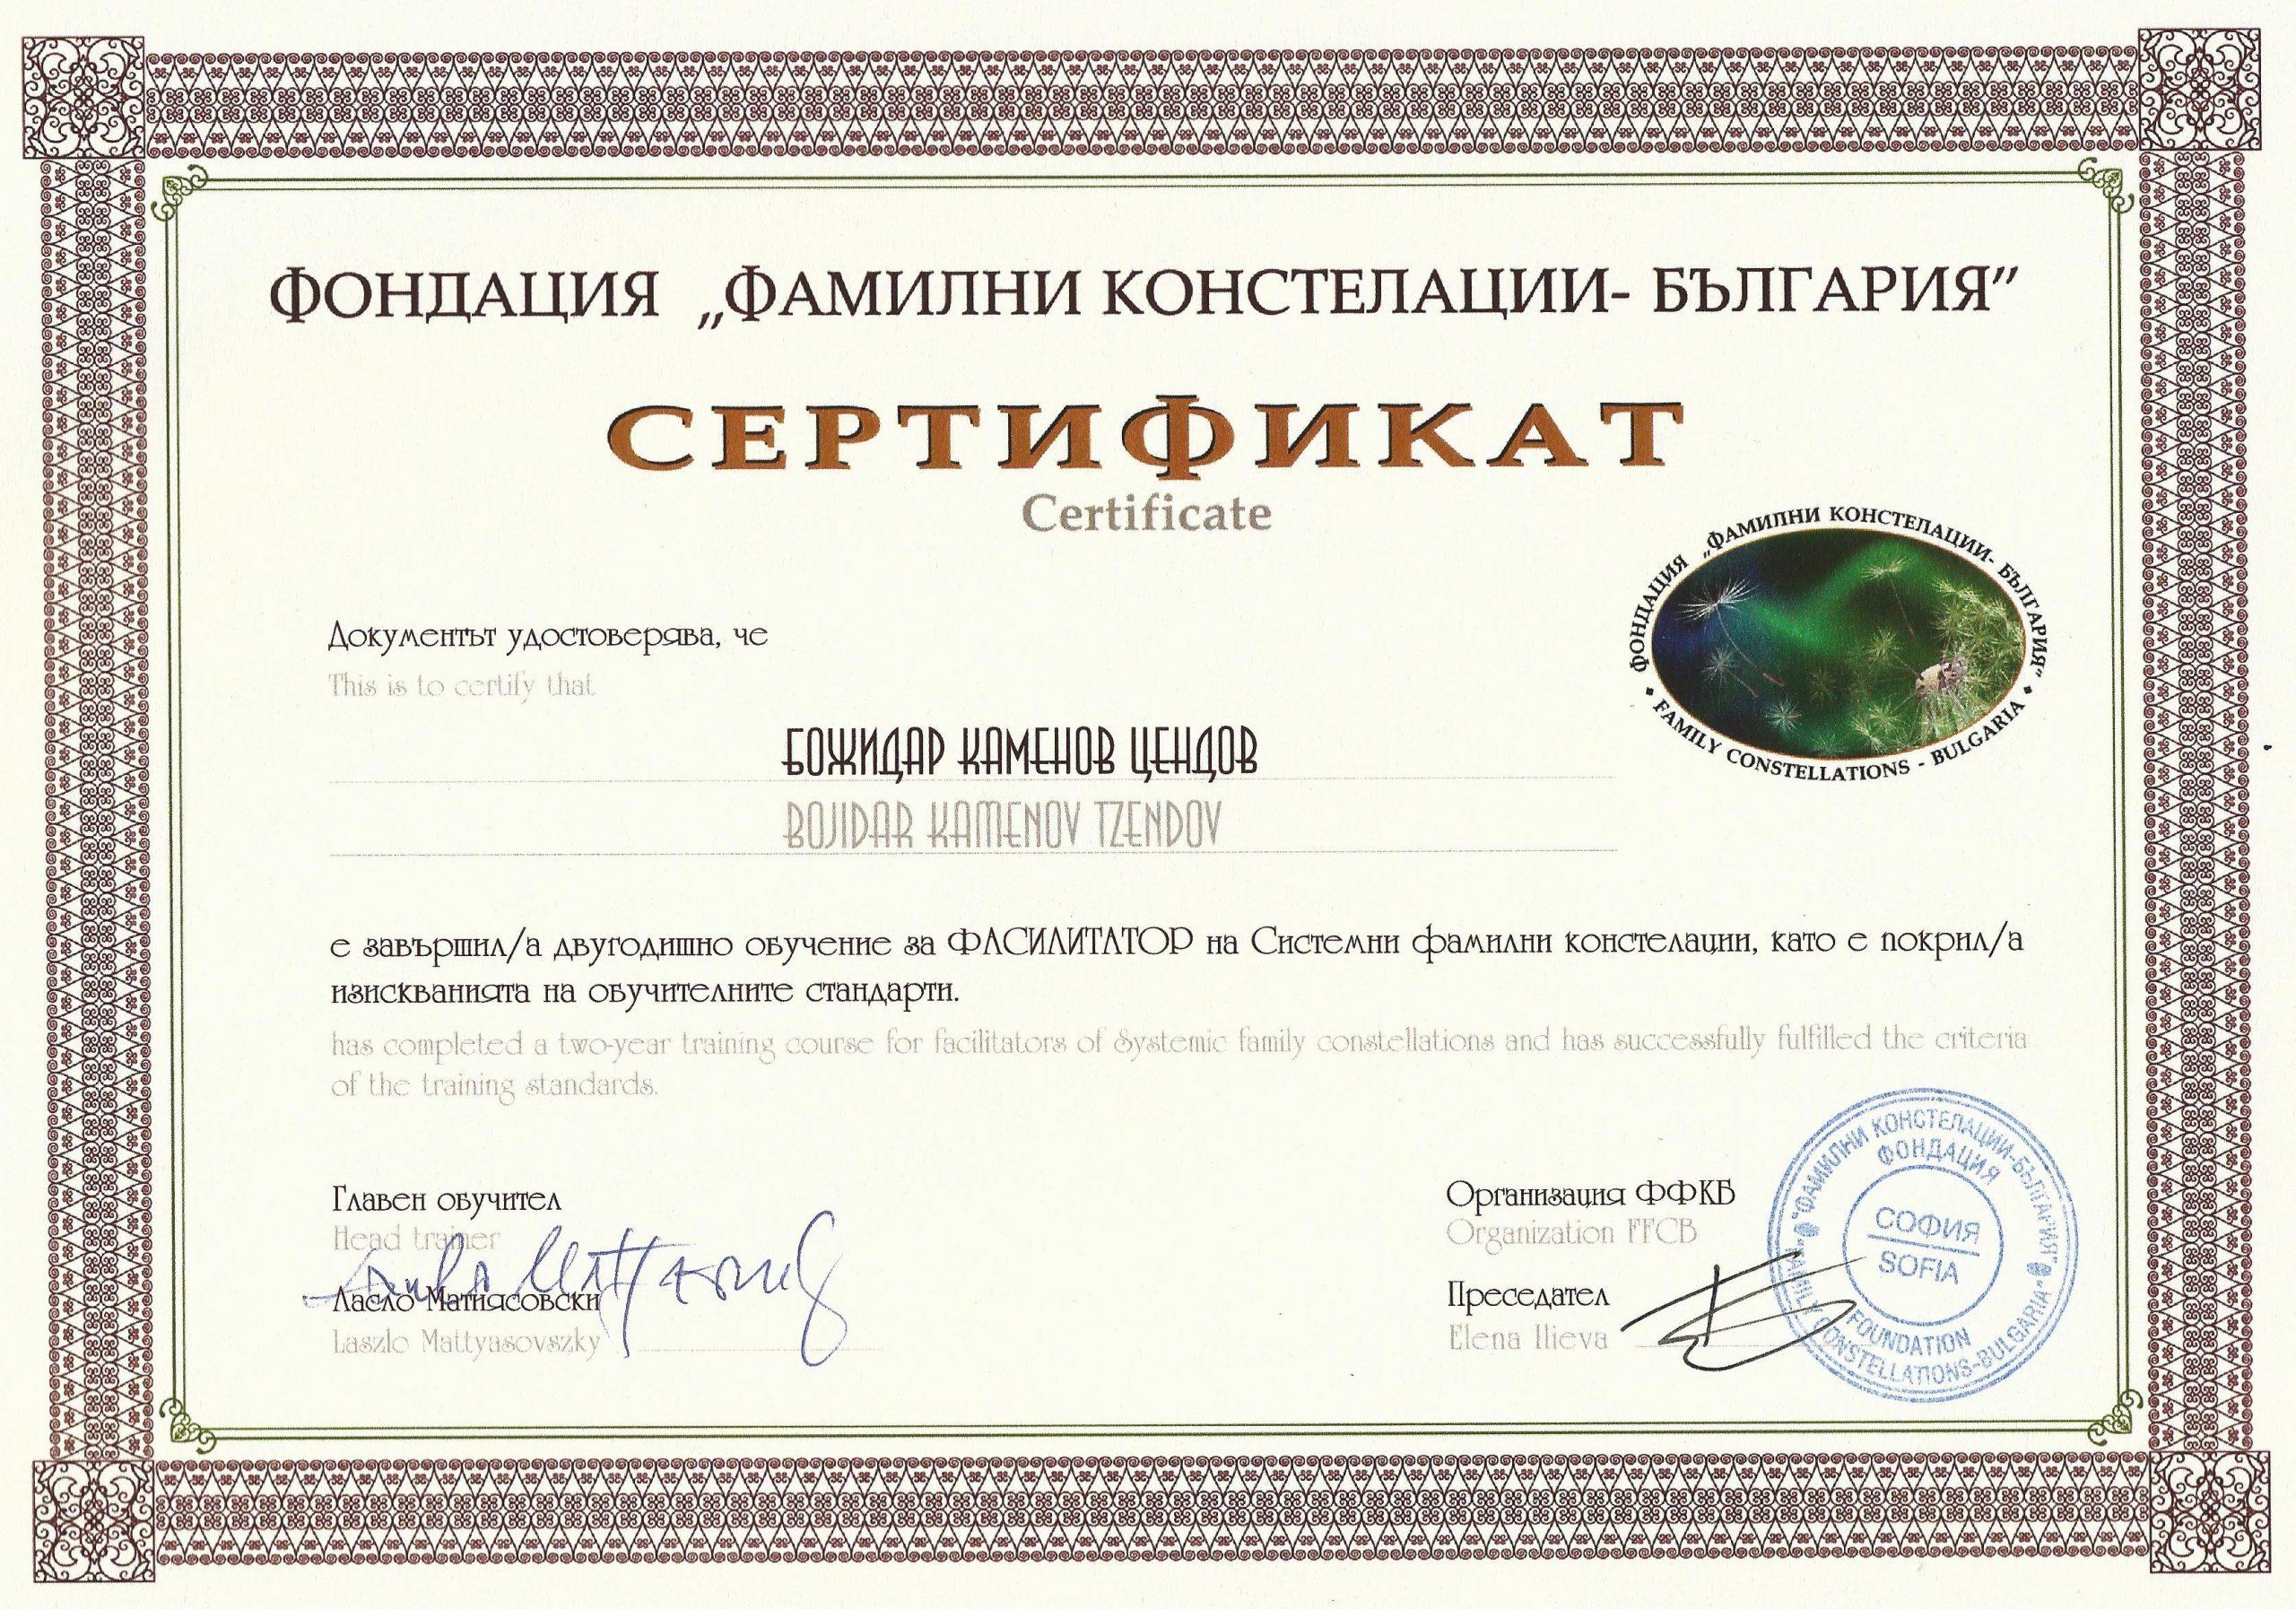 Сертификат Фамилни Констелации